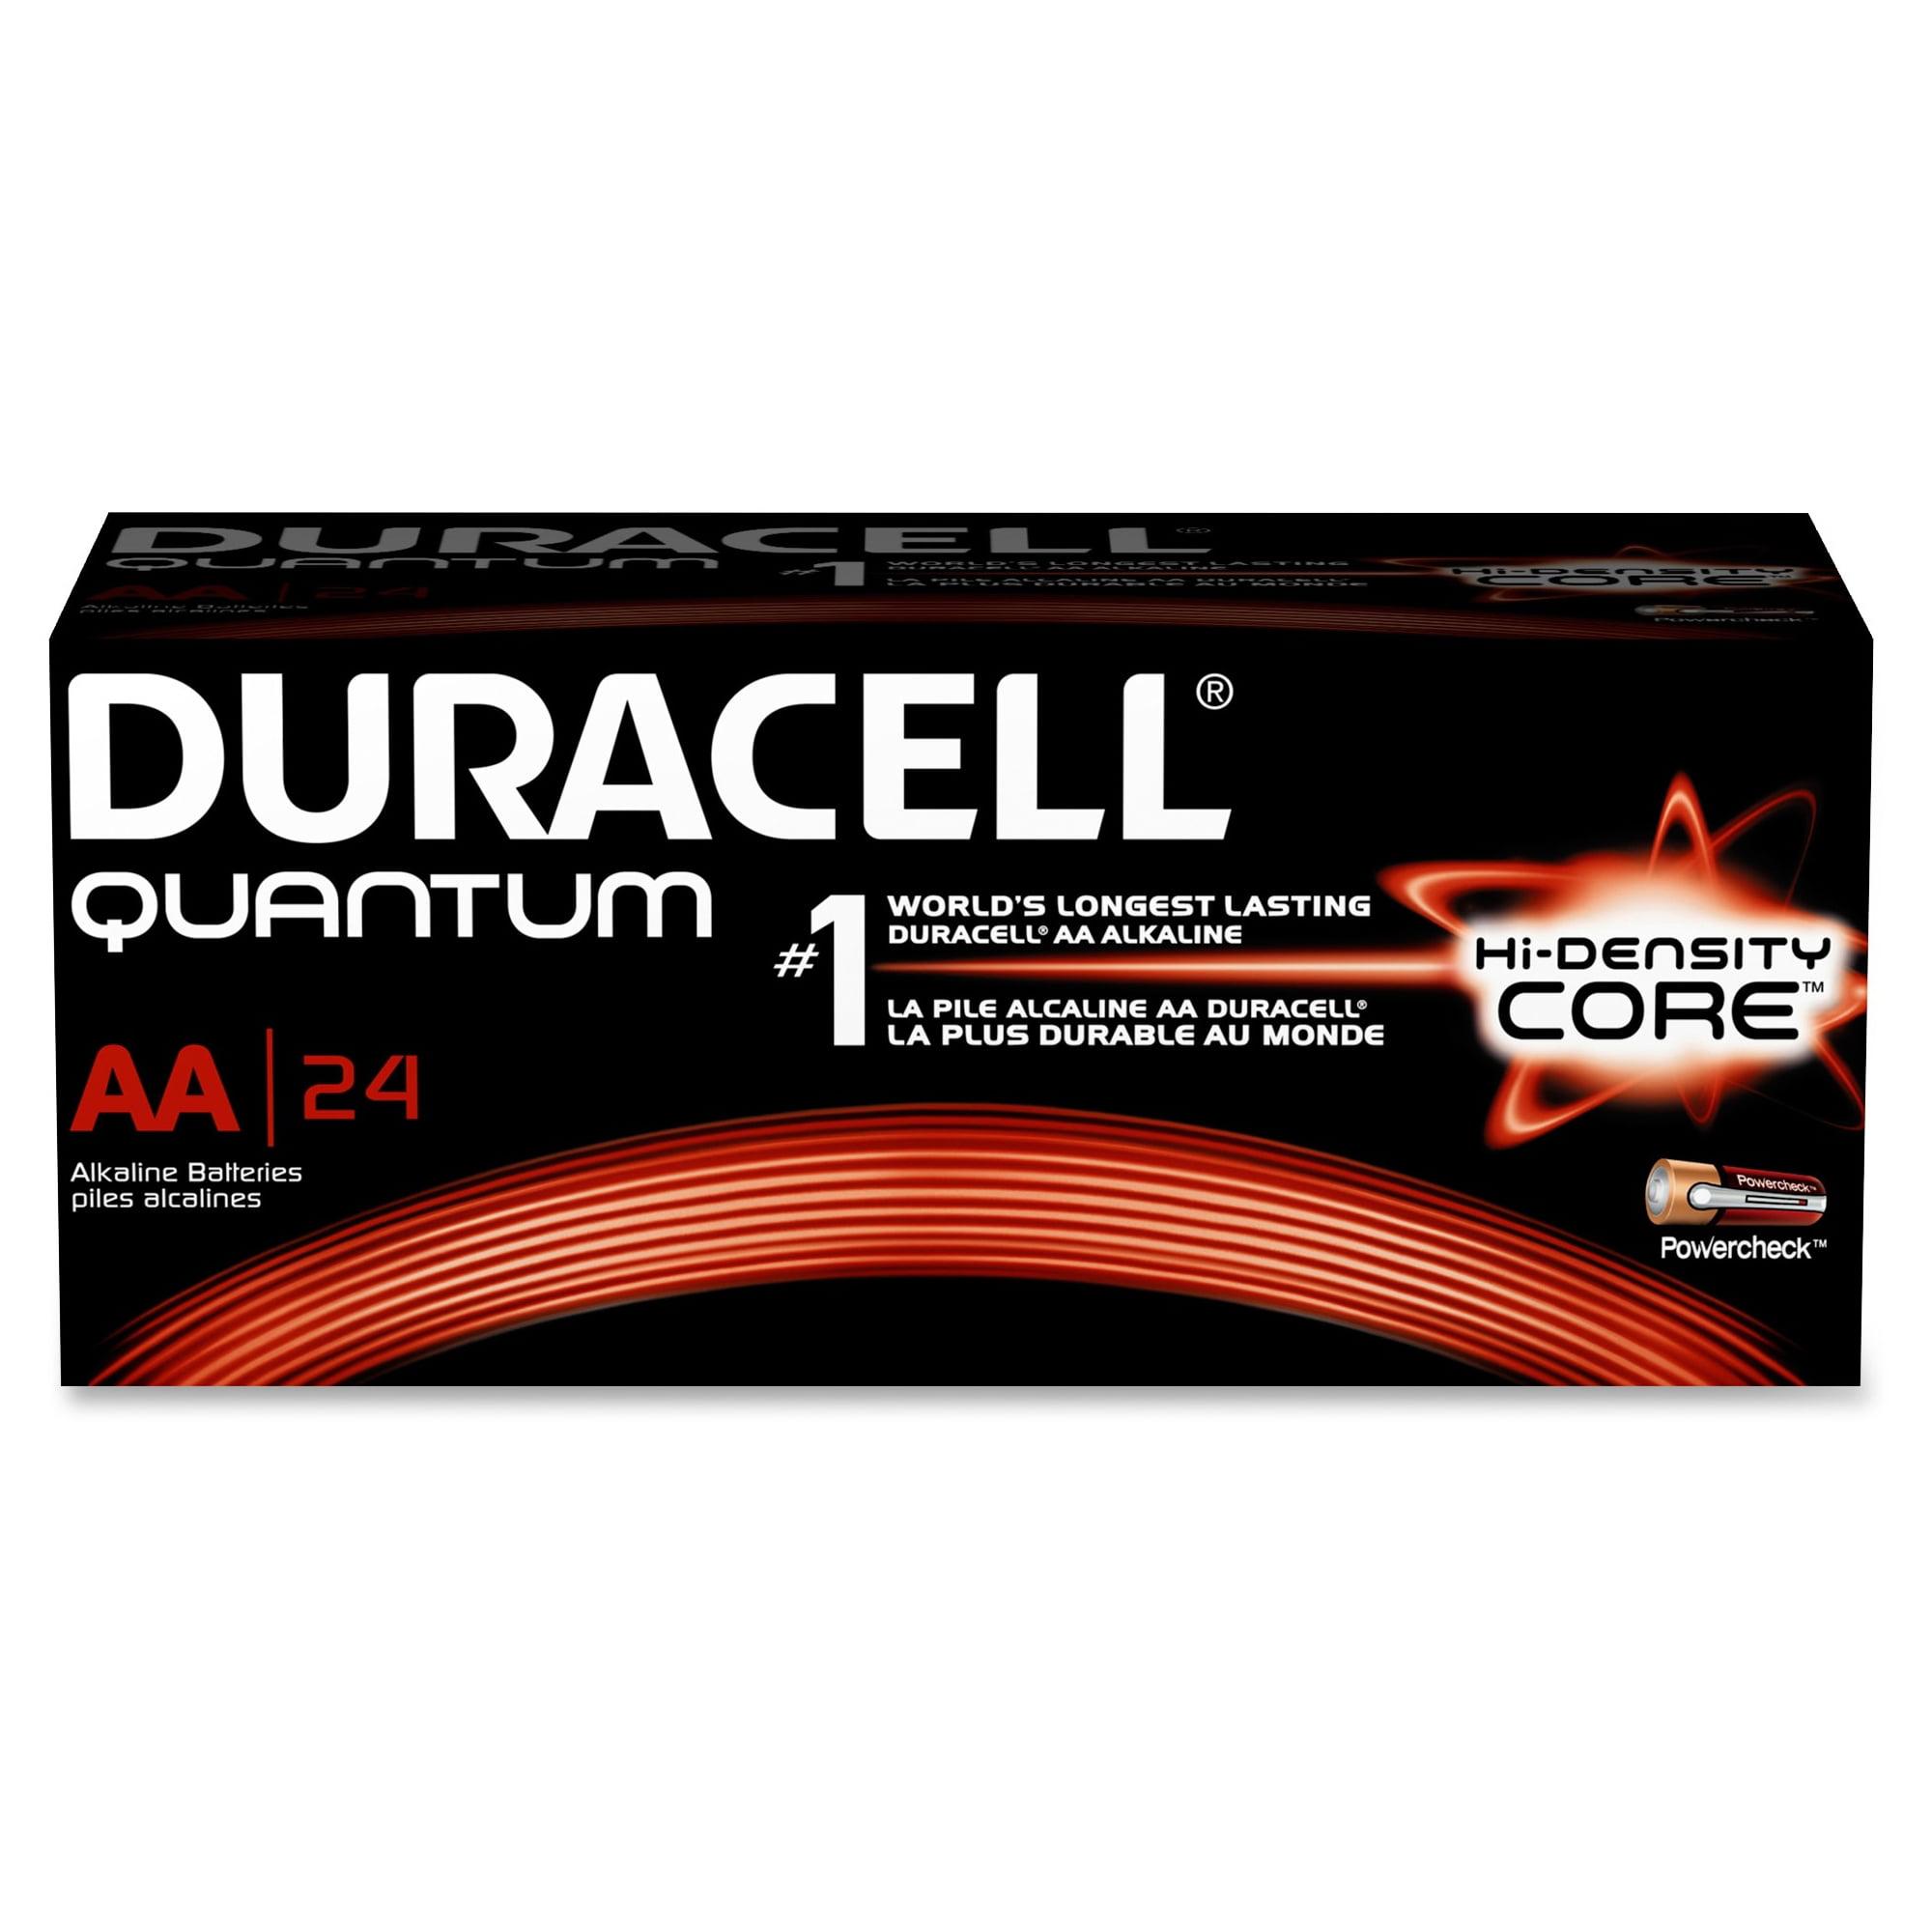 Duracell High-density Core Quantum Aa Batteries - Aa (qu1500bkdct)